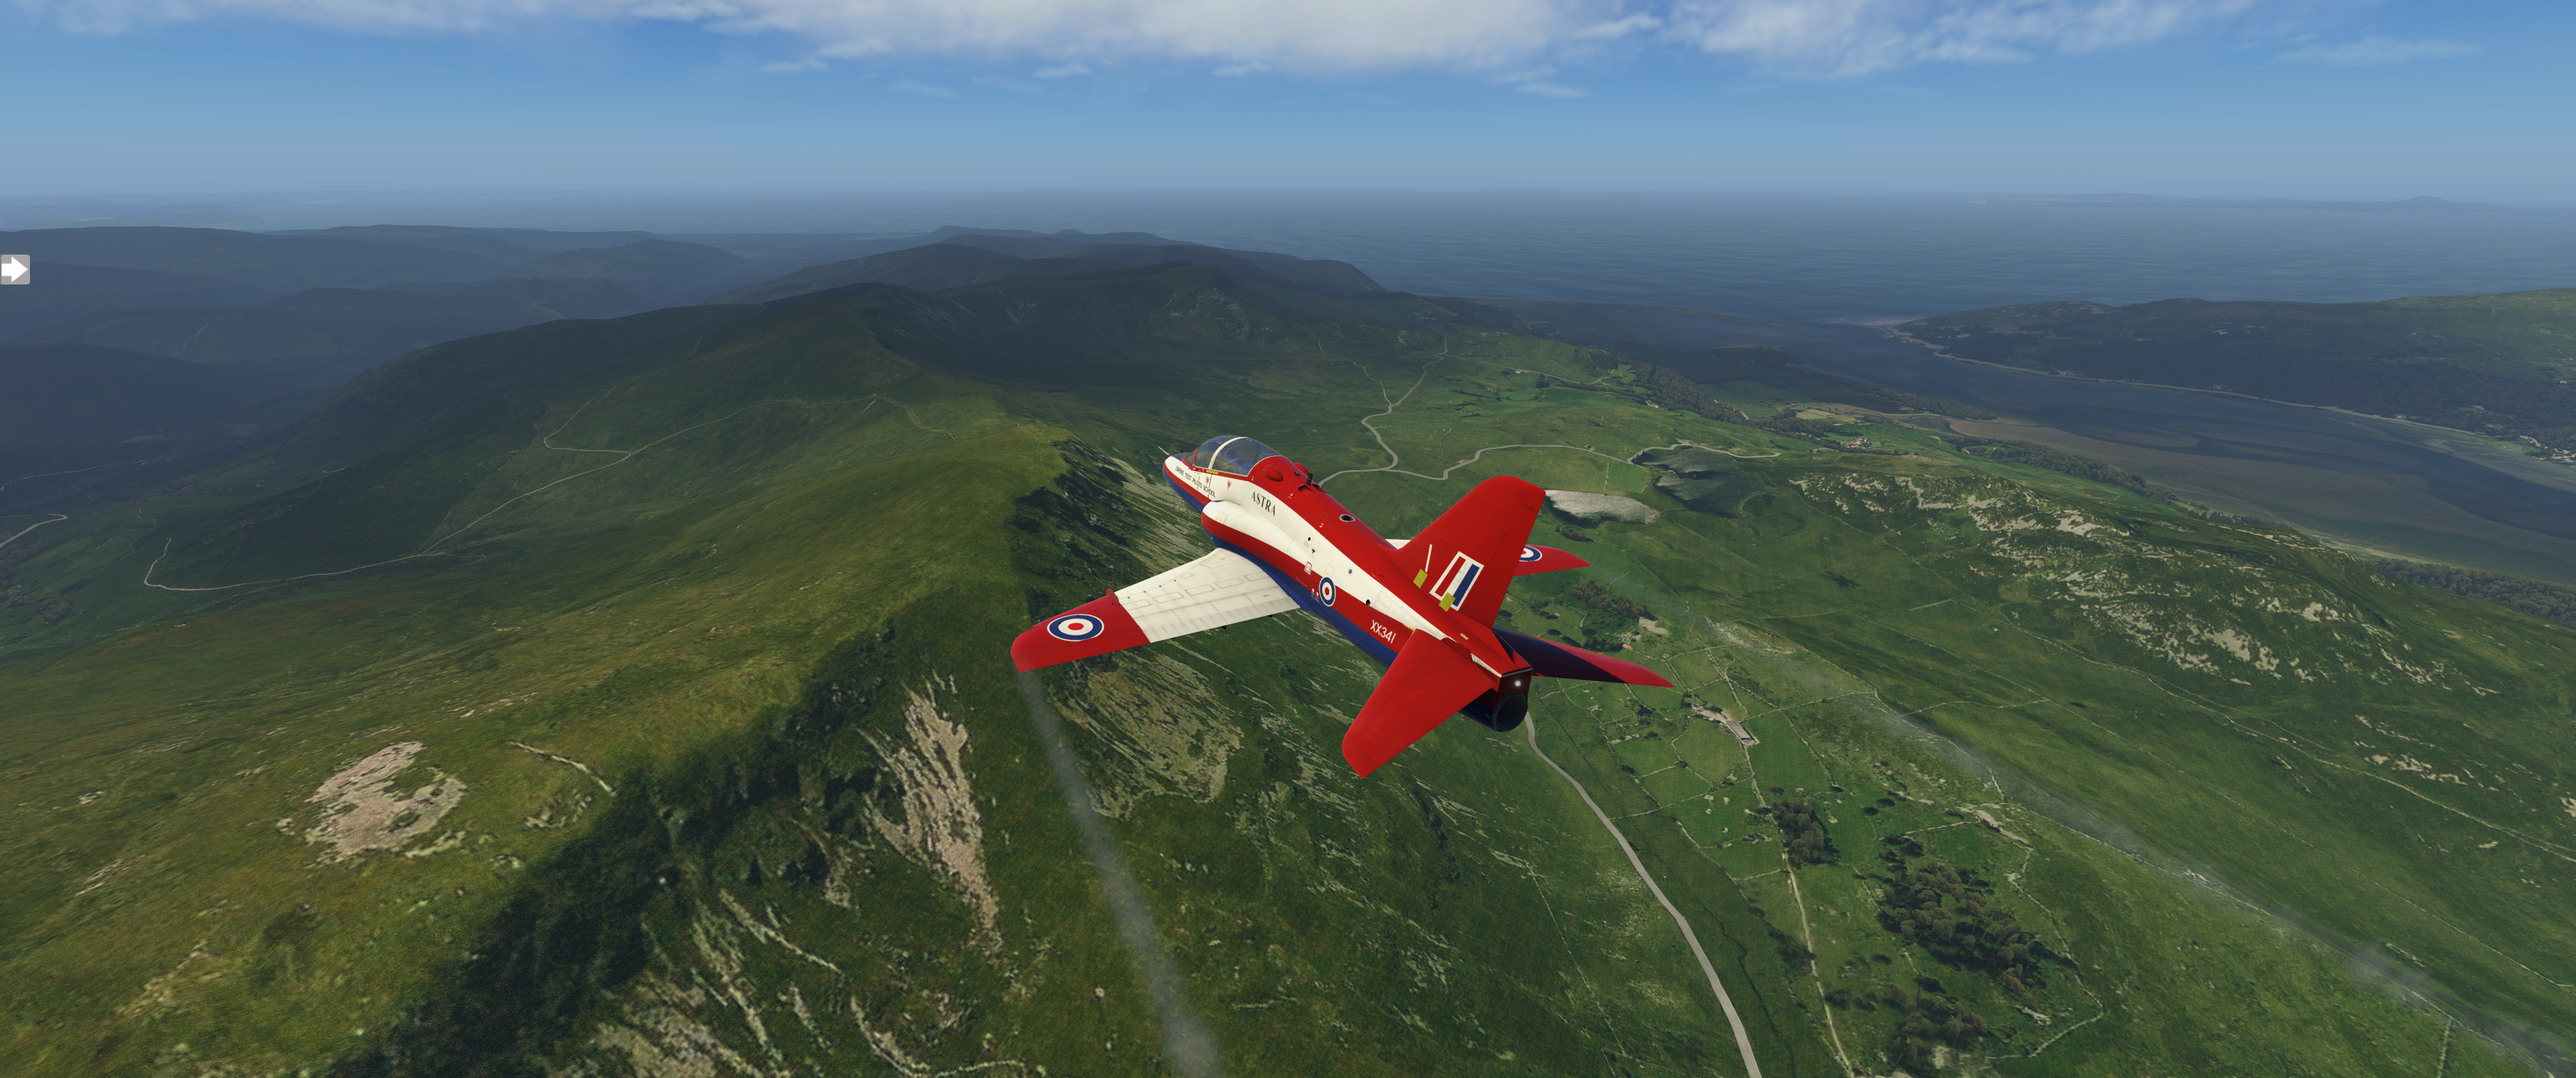 Just Flight Hawk T XP11 - Screenshots - Mutley's Hangar Forums